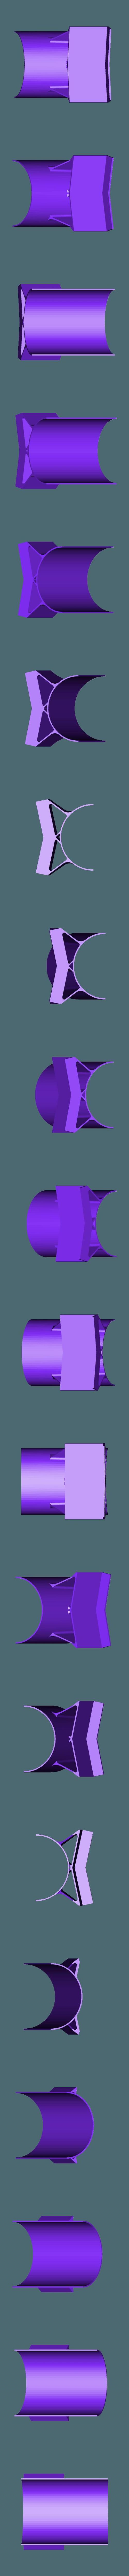 Thinner_Wing_Rear_Mount.stl Download free STL file Flyer Mk. 1 • 3D printing object, billbo1958